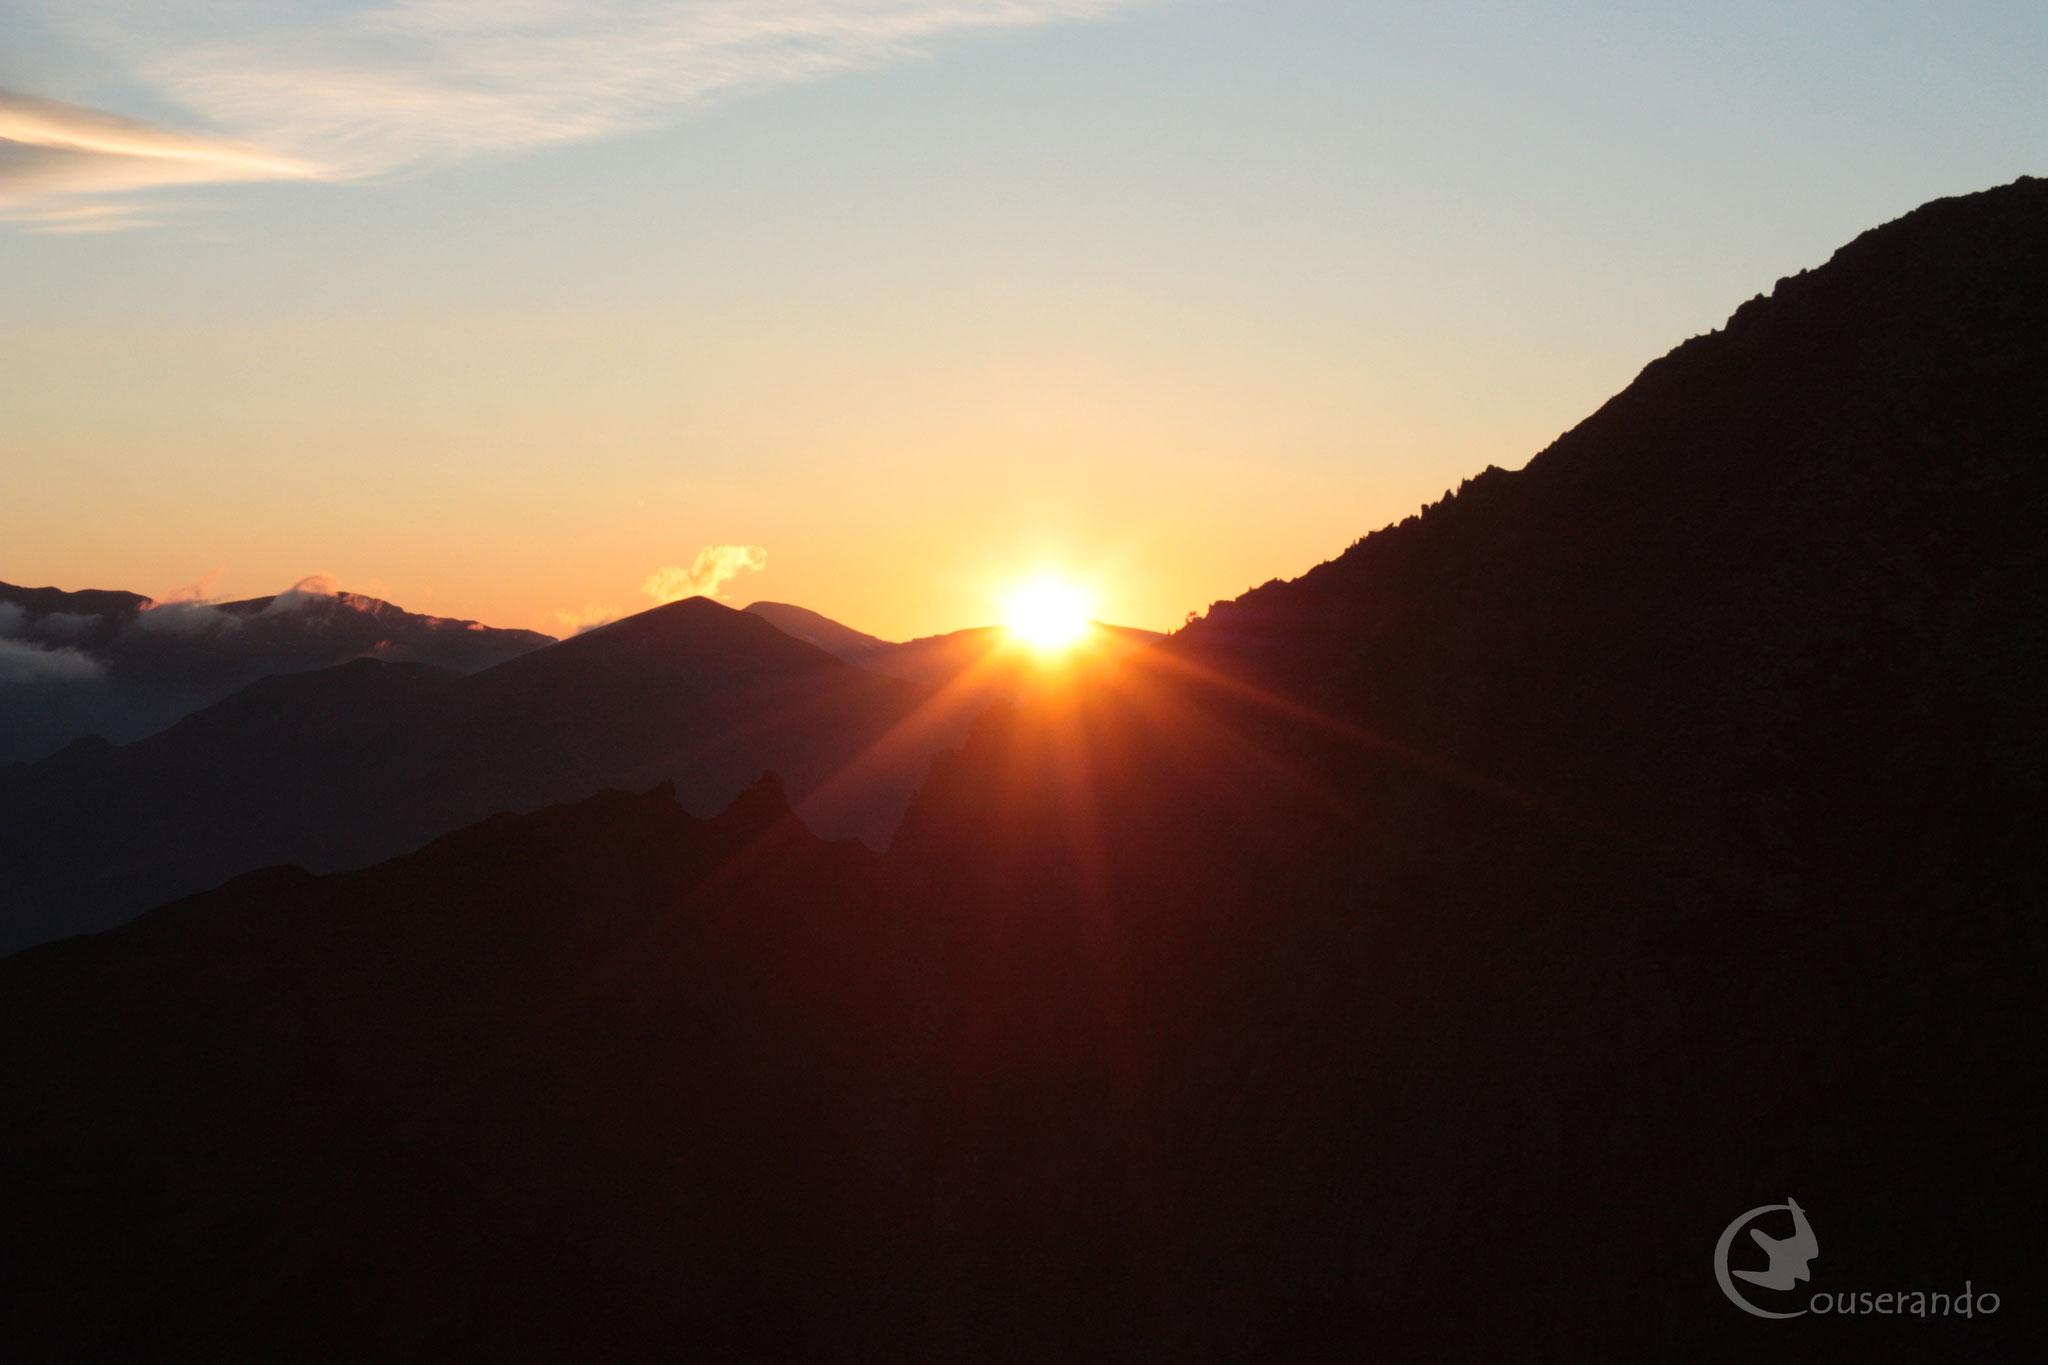 Lever de soleil depuis le col de Cerda - Doriane GAUTIER, Couserando - Randonnée Nature Ariège Pyrénées